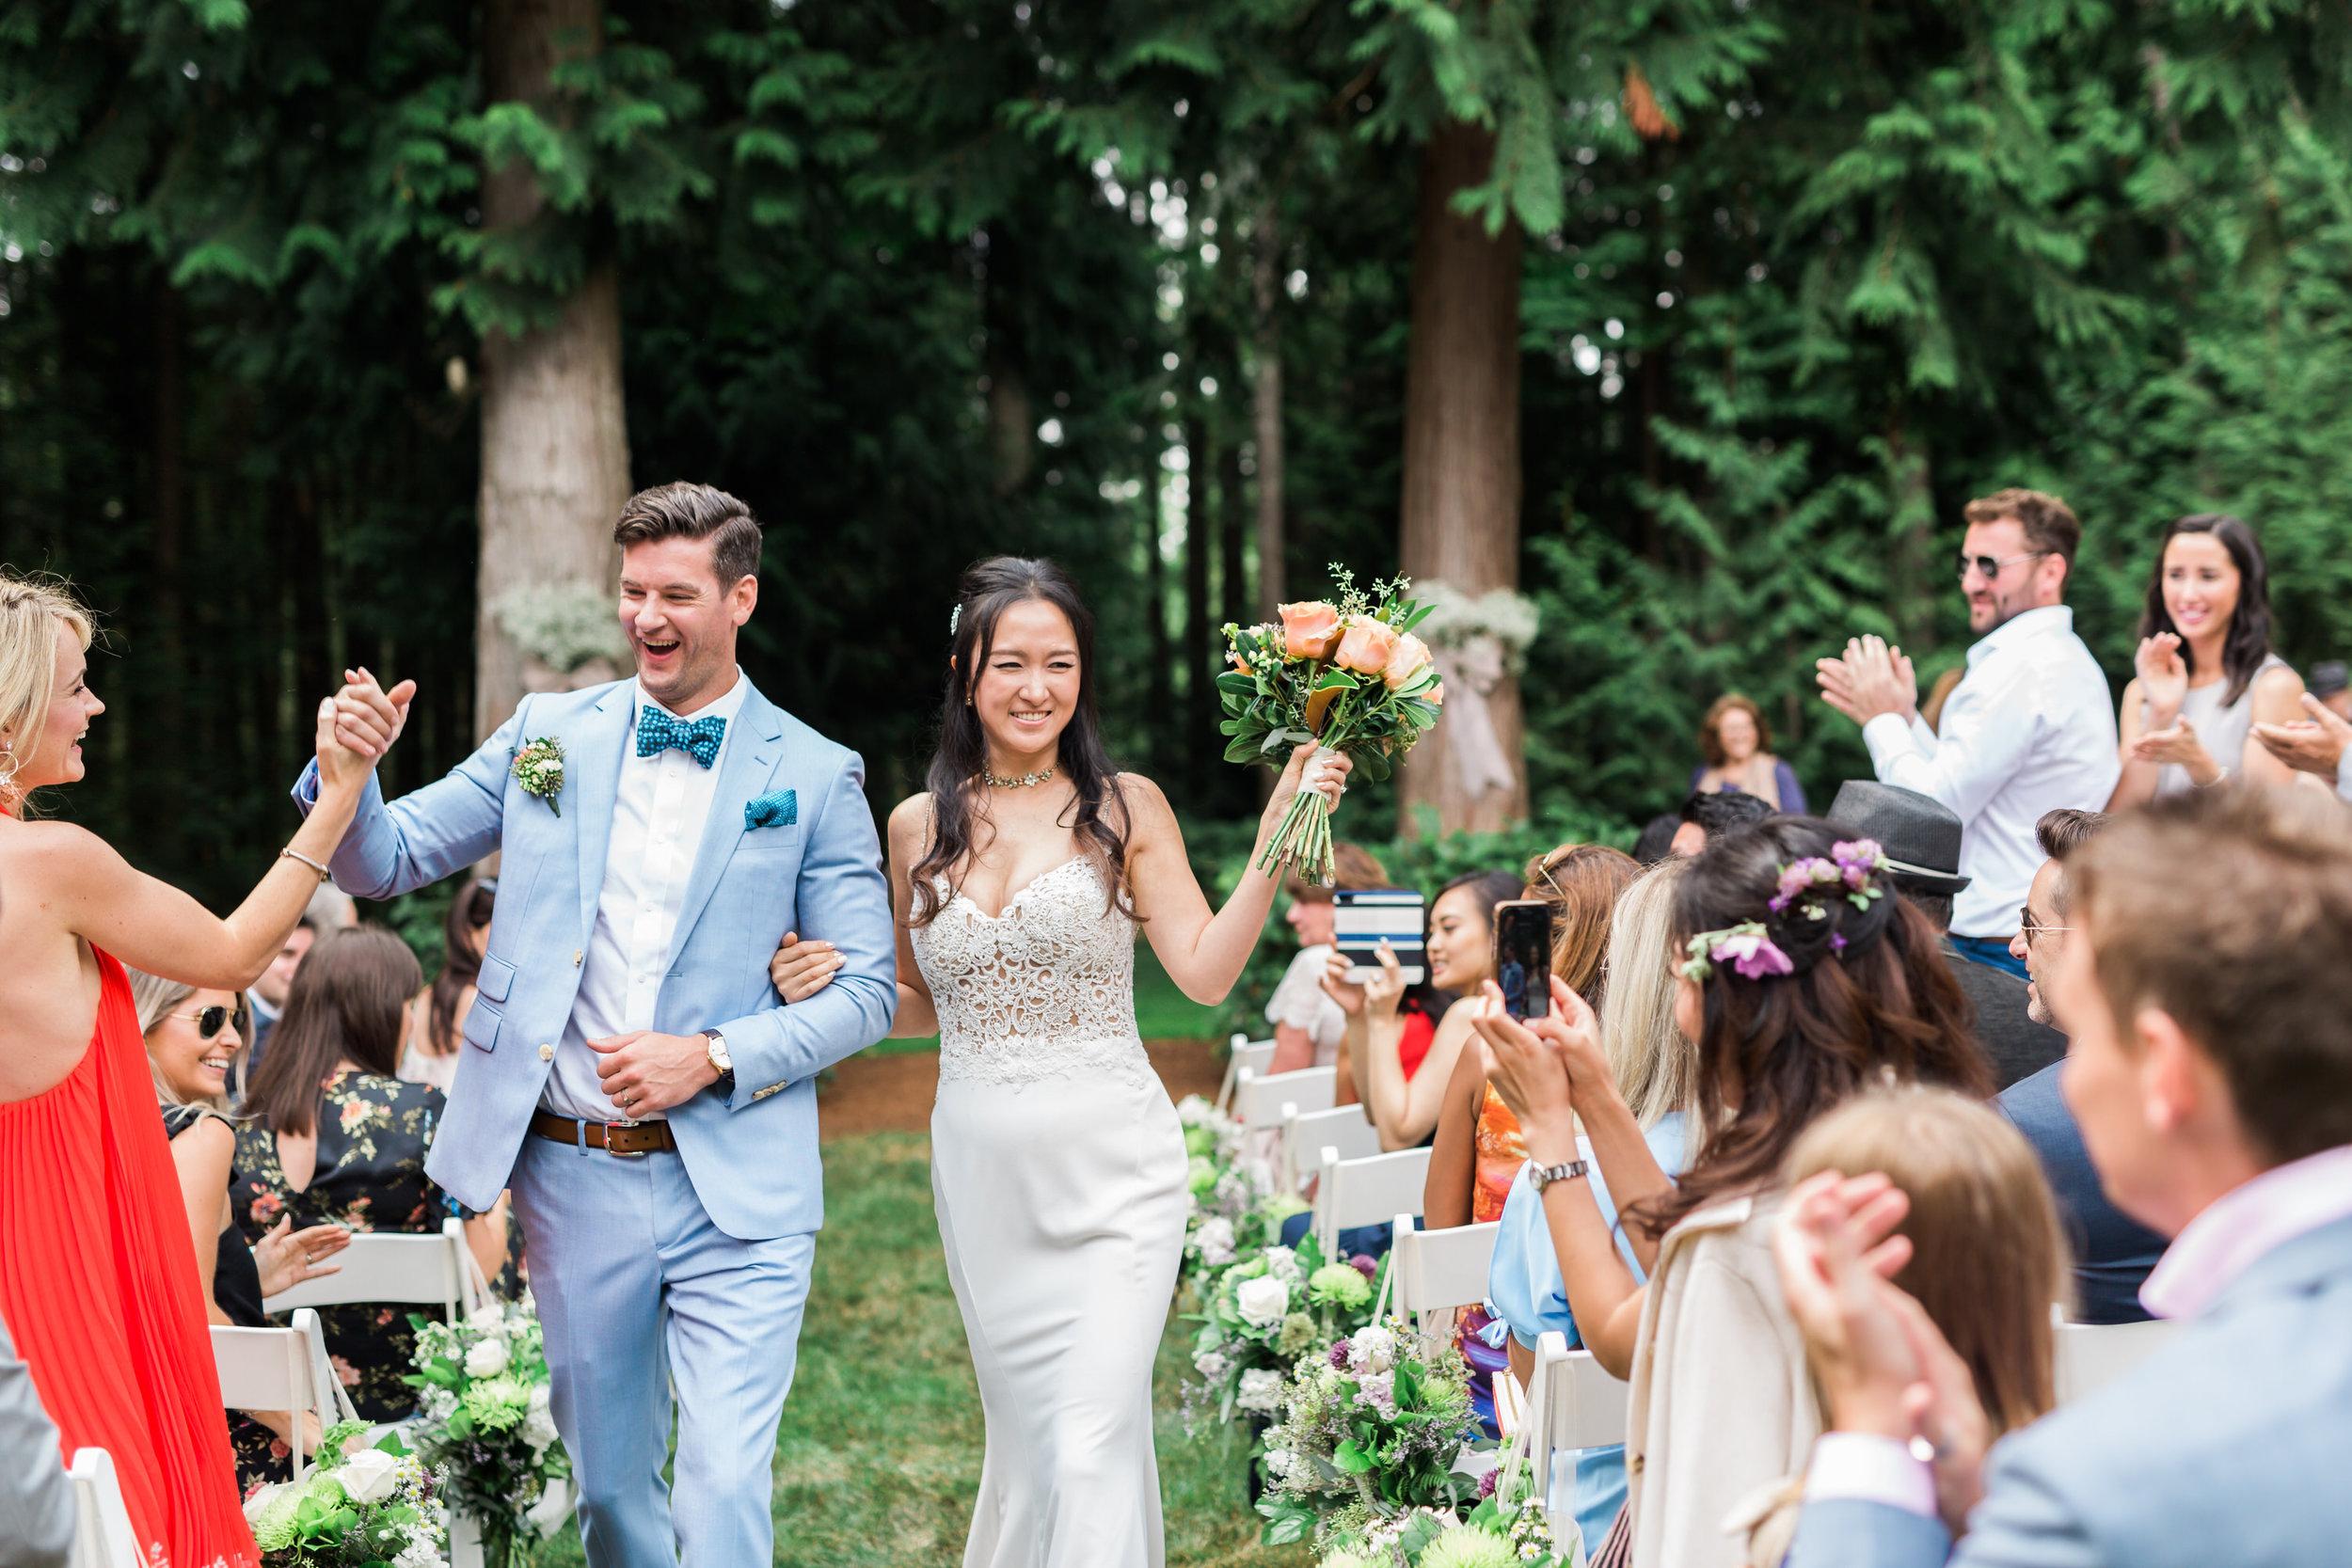 Linwood House Wedding Photos - Roberts Creek Wedding Photos - Vancouver Wedding Photographer & Videographer - Sunshine Coast Wedding Photos - Sunshine Coast Wedding Photographer - Jennifer Picard Photography - IMG_6568.jpg